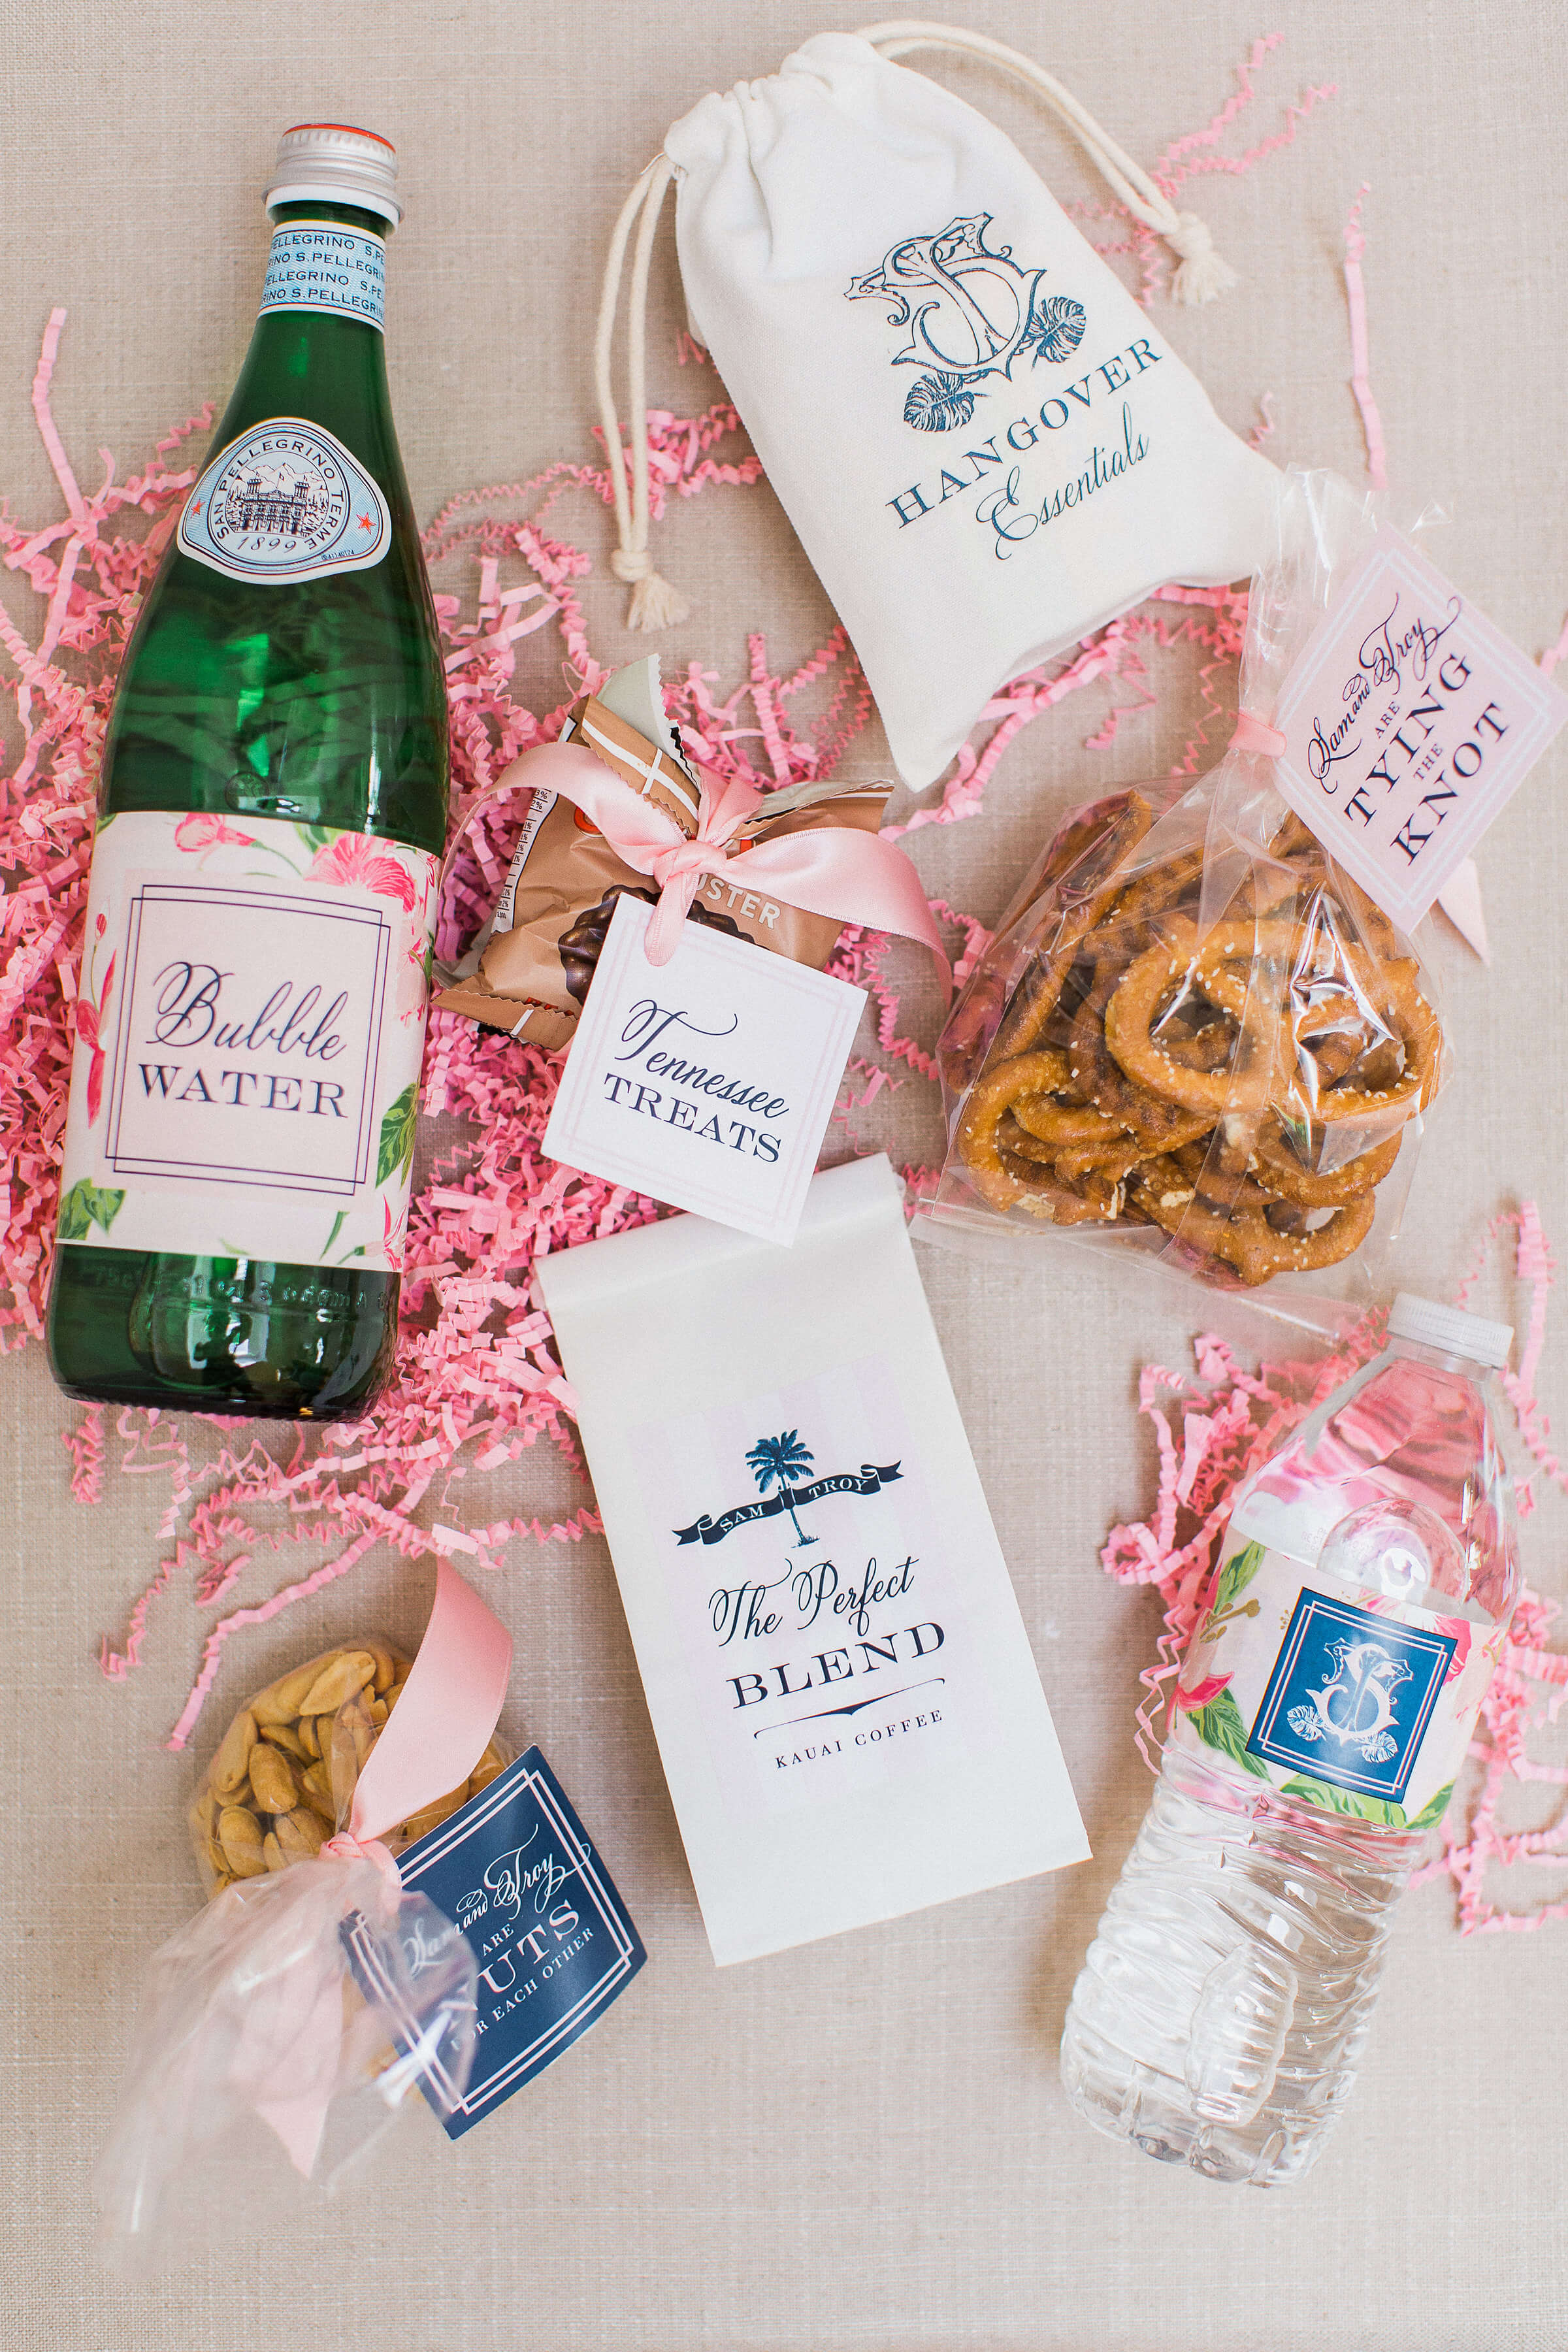 Blush And Gold Hawaiian Wedding Nico And Lala Chocolate Hawaiian Gift Bag. Hawaii Wedding Gift Bags Gift Ideas